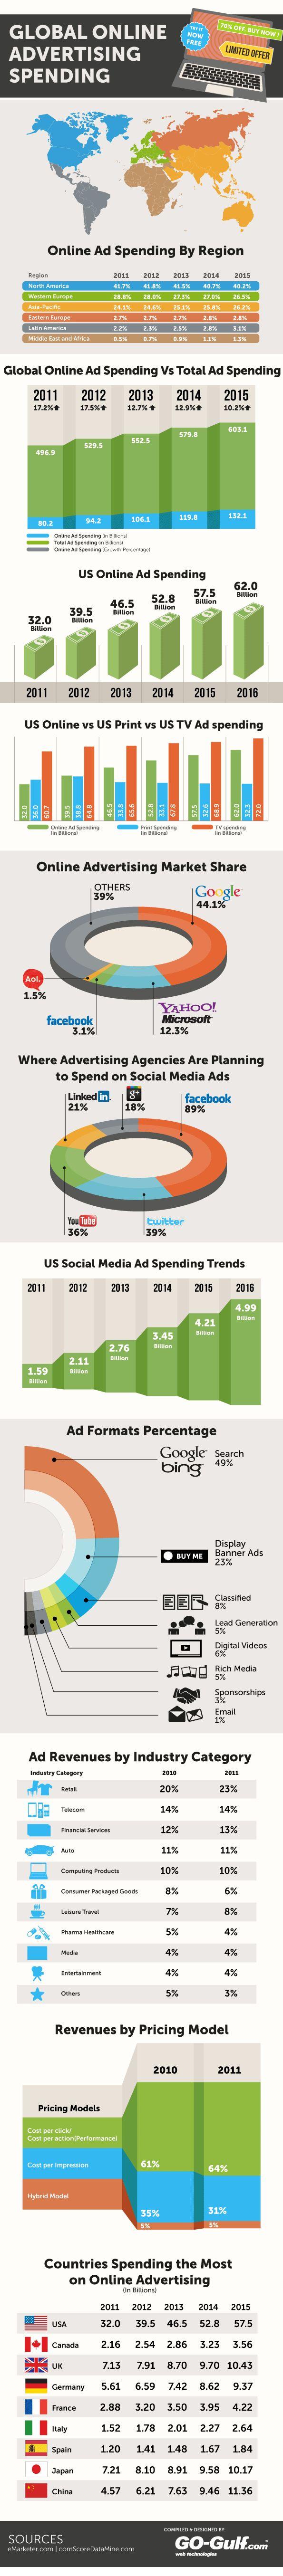 Global Online Advertising Spending [INFOGRAPHIC]